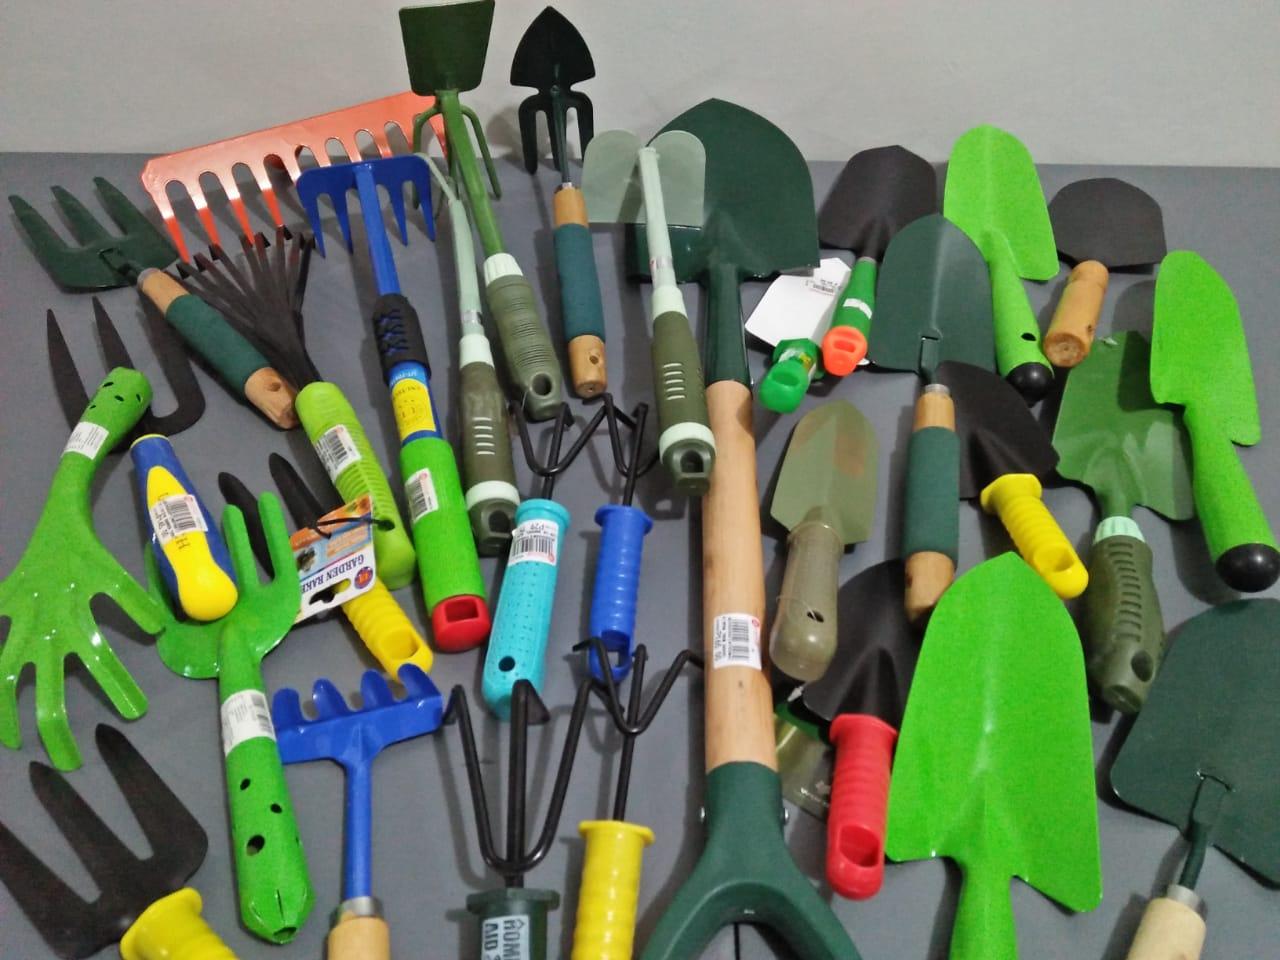 Lead-Free Gardening Tools